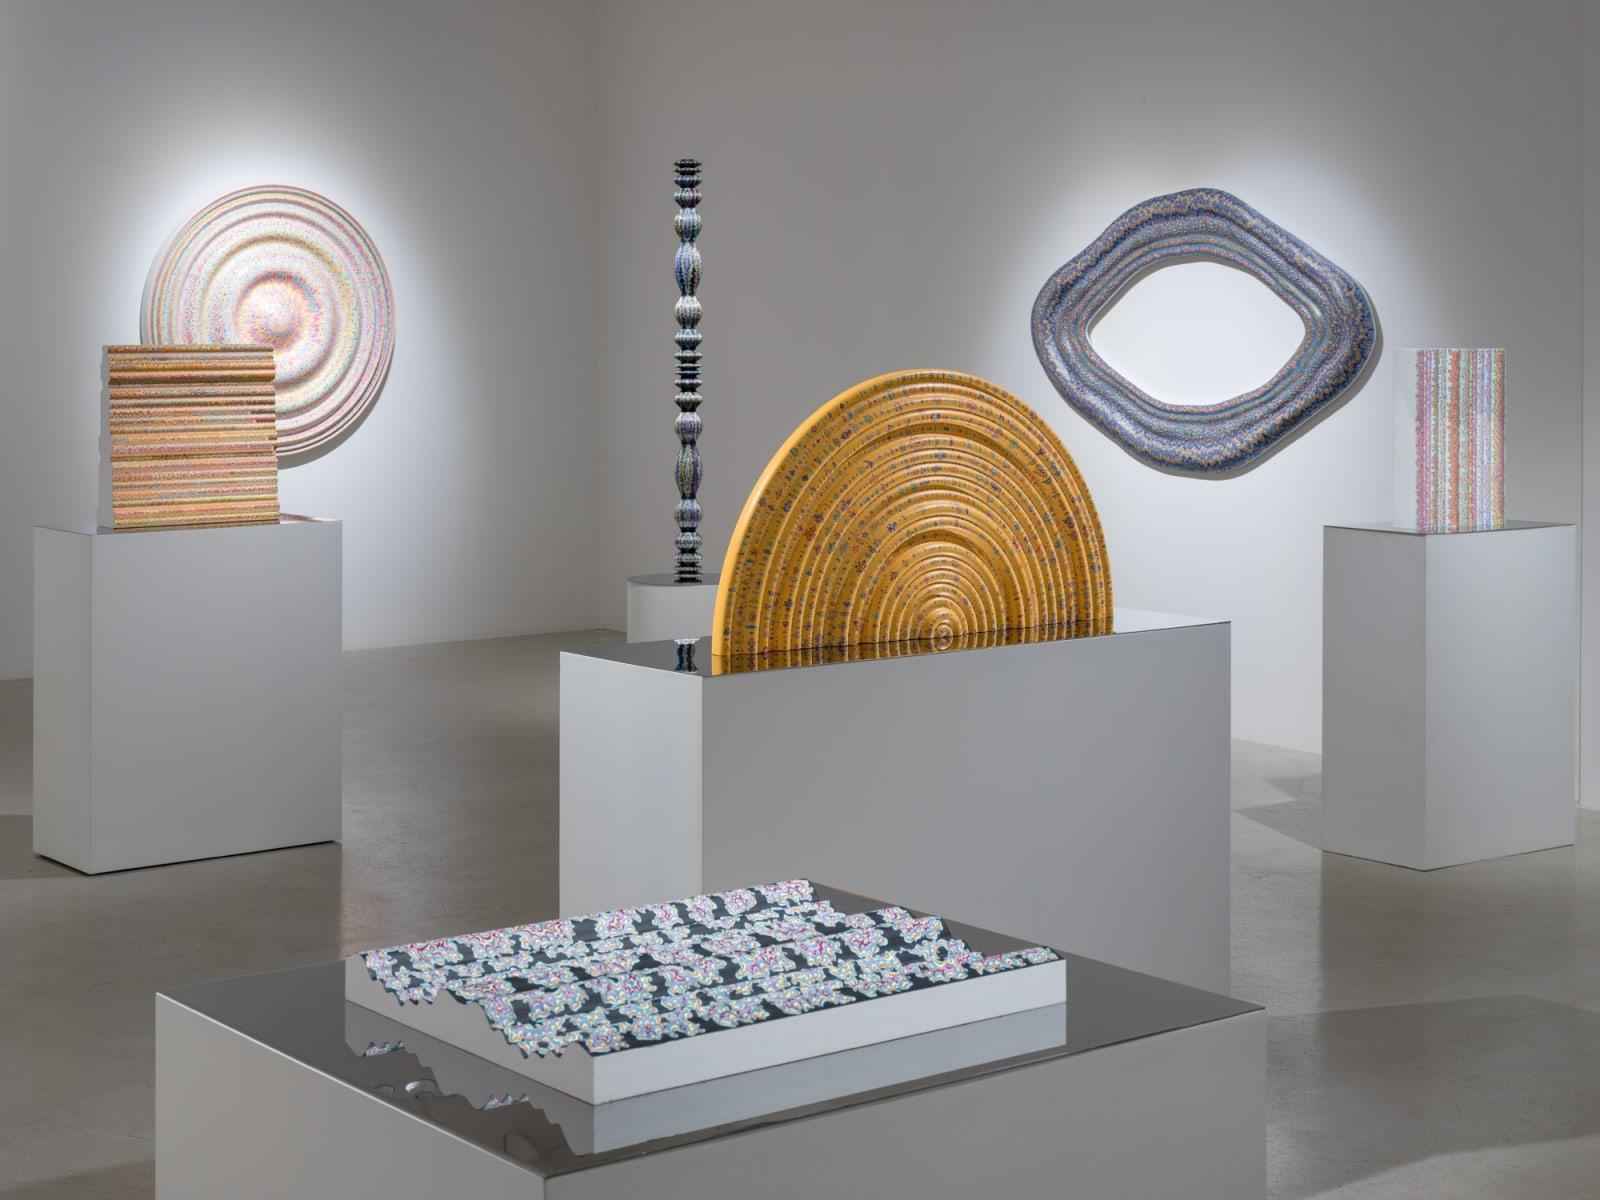 Kelsey Brookes | Fibonacci, Waveforms and Capsid Symmetries